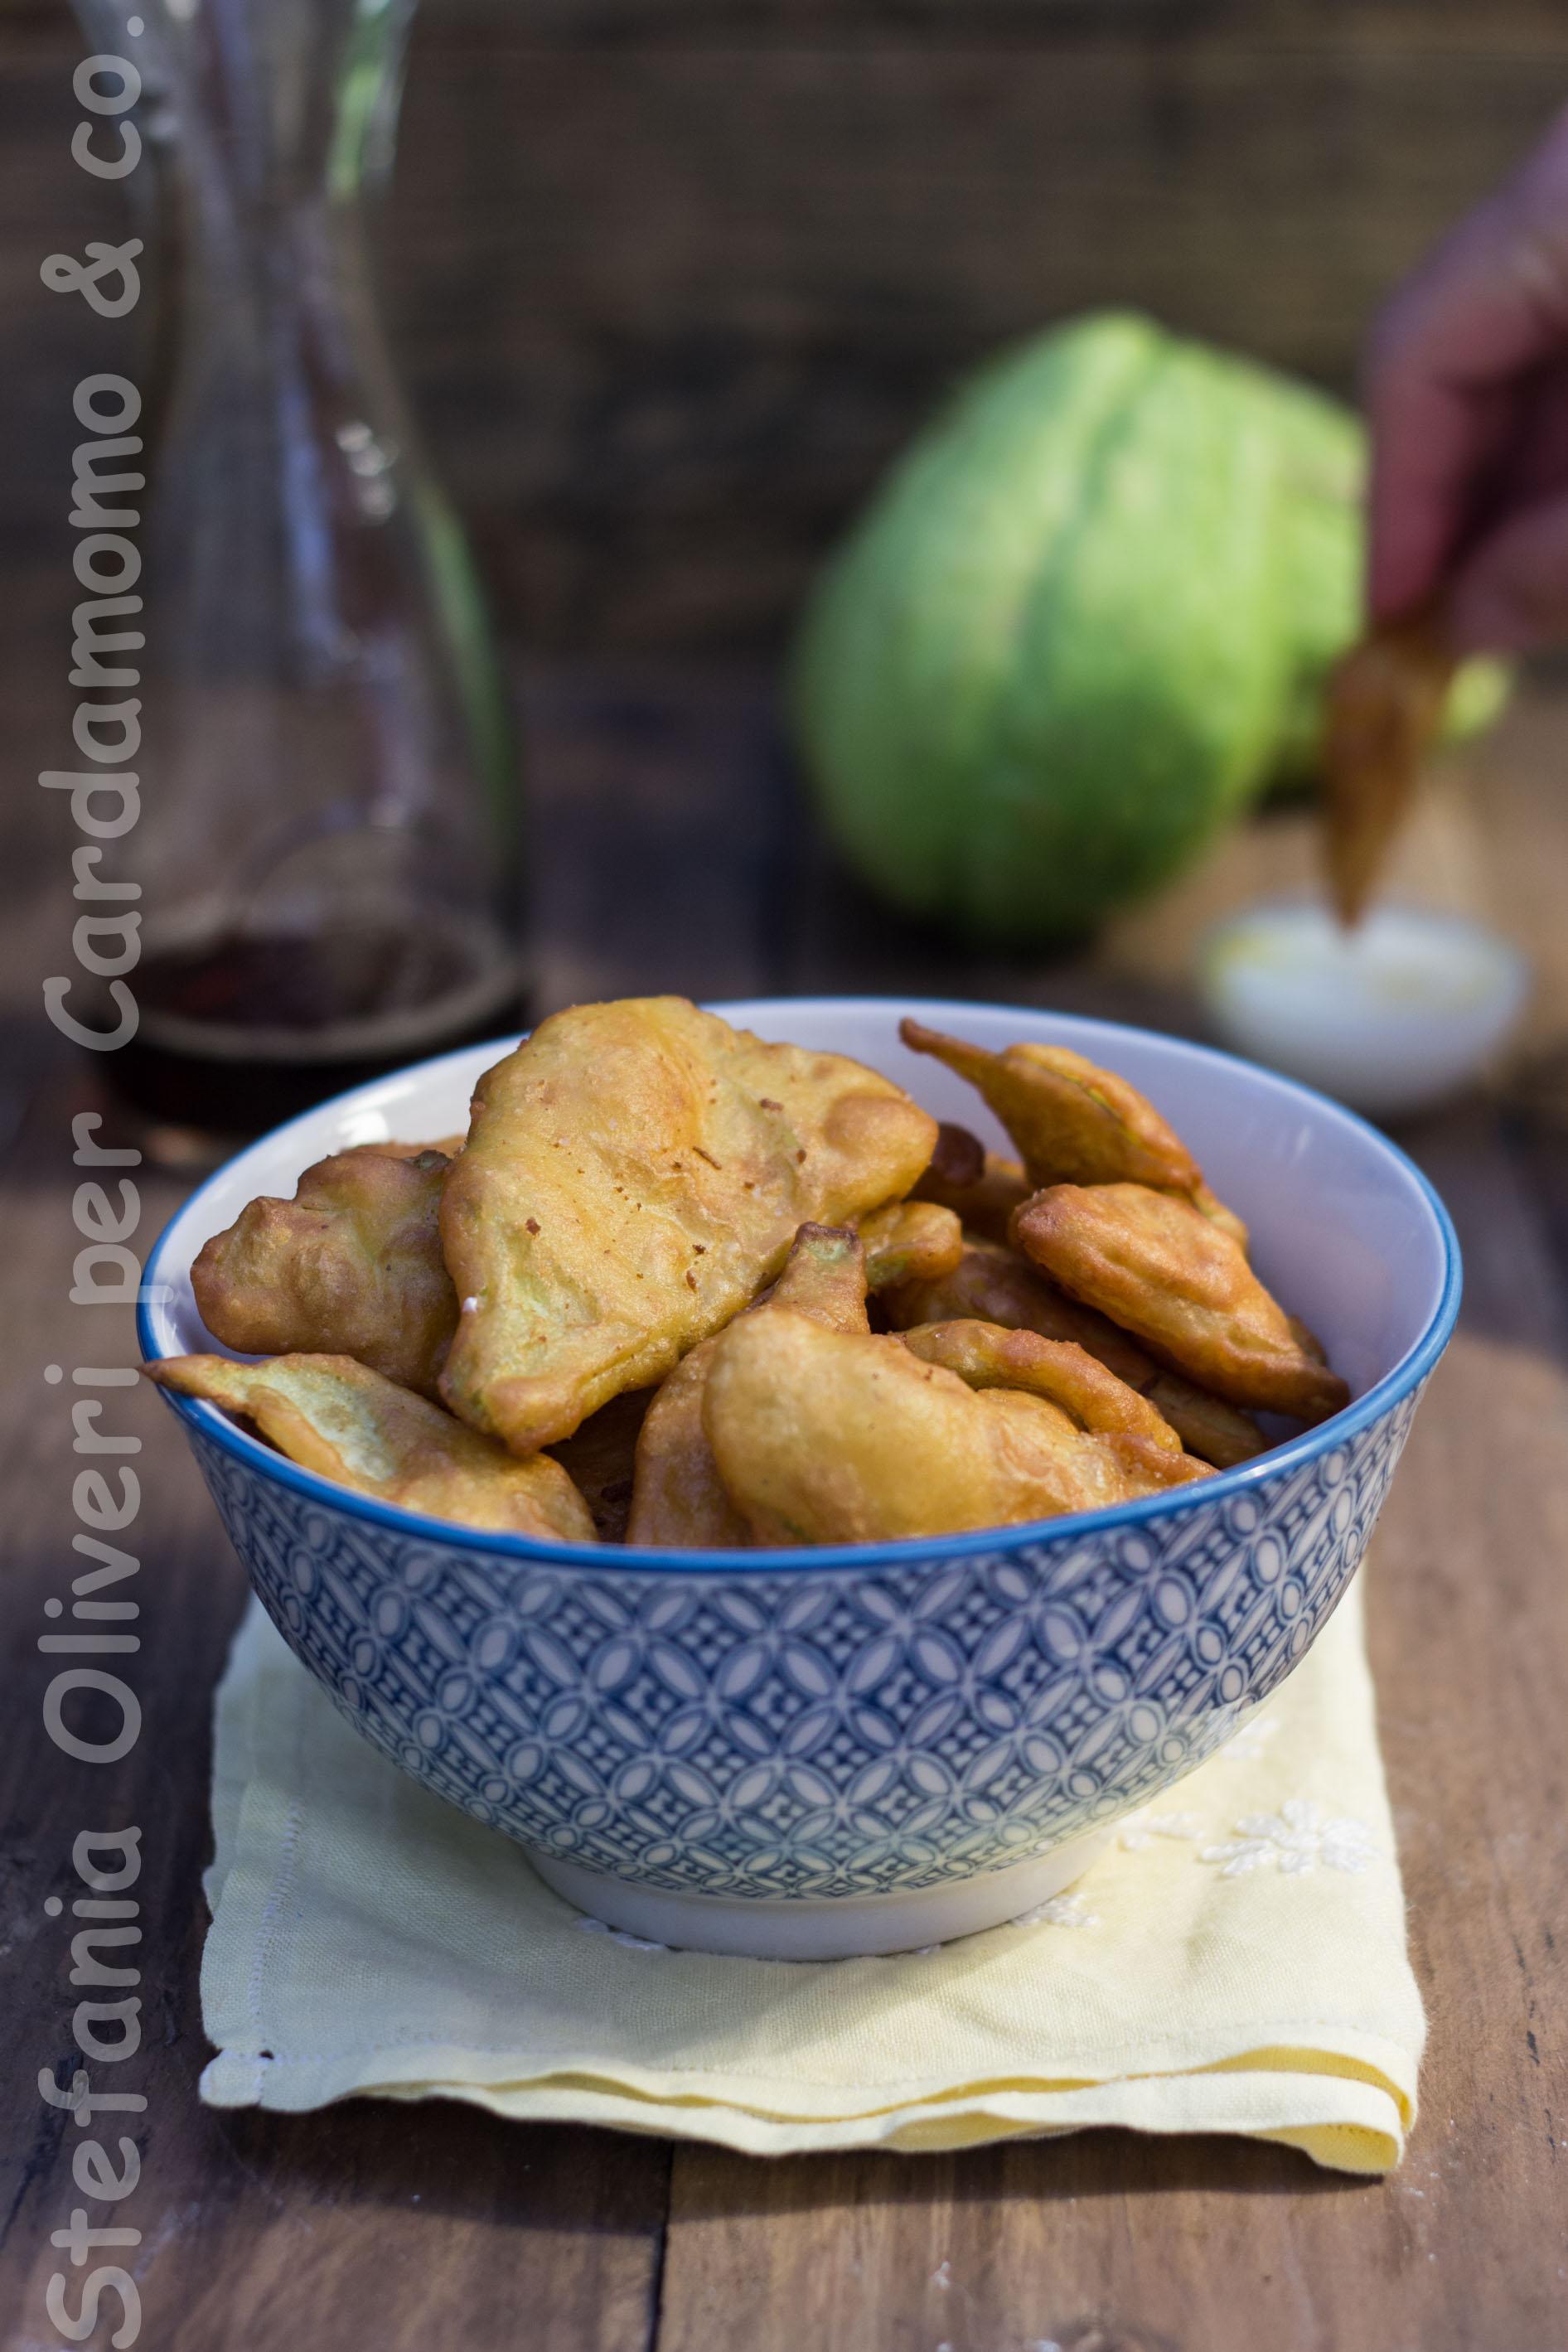 Pakora con zucchina centenaria - Cardamomo & coPakora con zucchina centenaria - Cardamomo & co